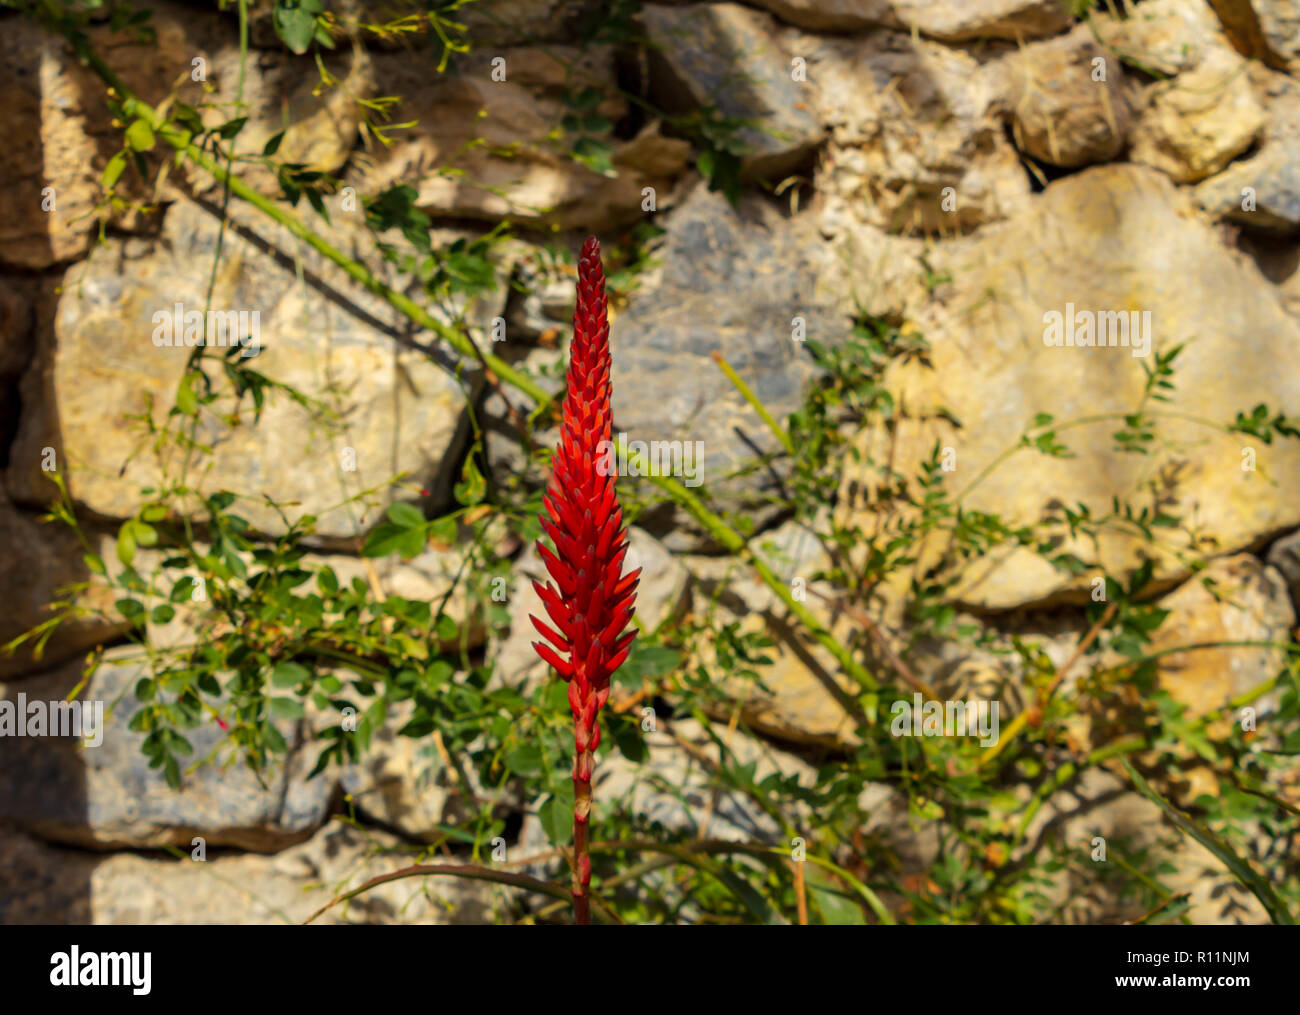 Aloe Vera plant in Flower, December, Spain - Stock Image